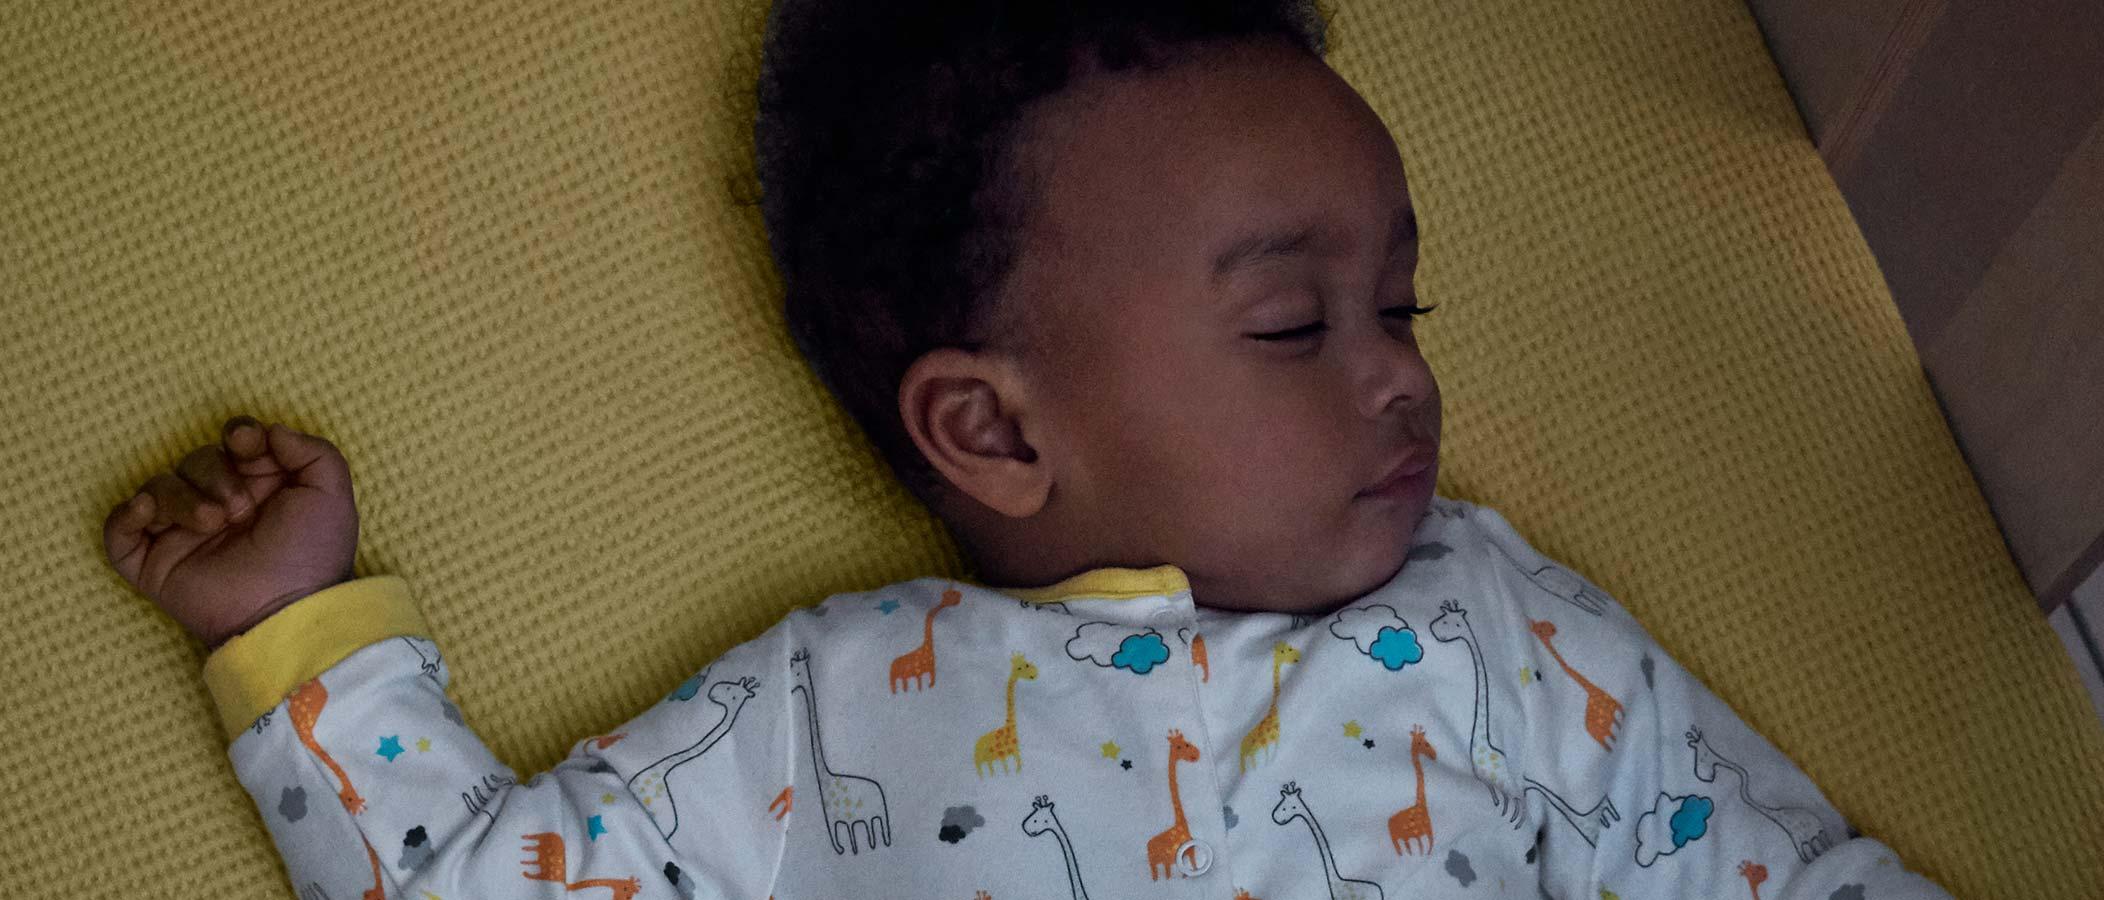 Baby Sleeping in a Wooden Crib